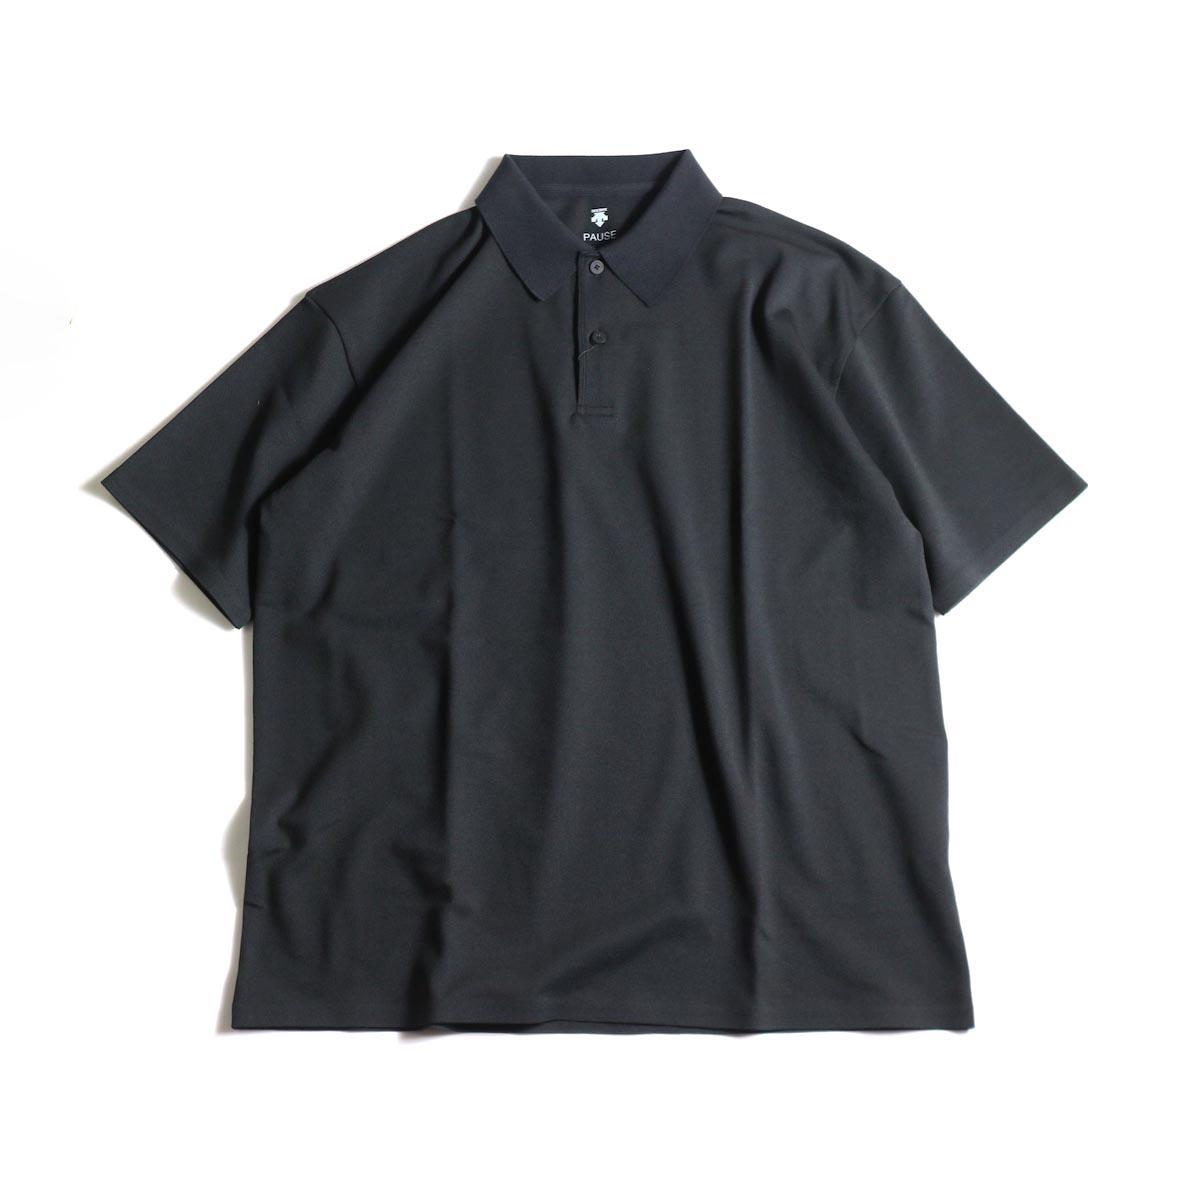 DESCENTE PAUSE / POLO SHIRT (Black)正面